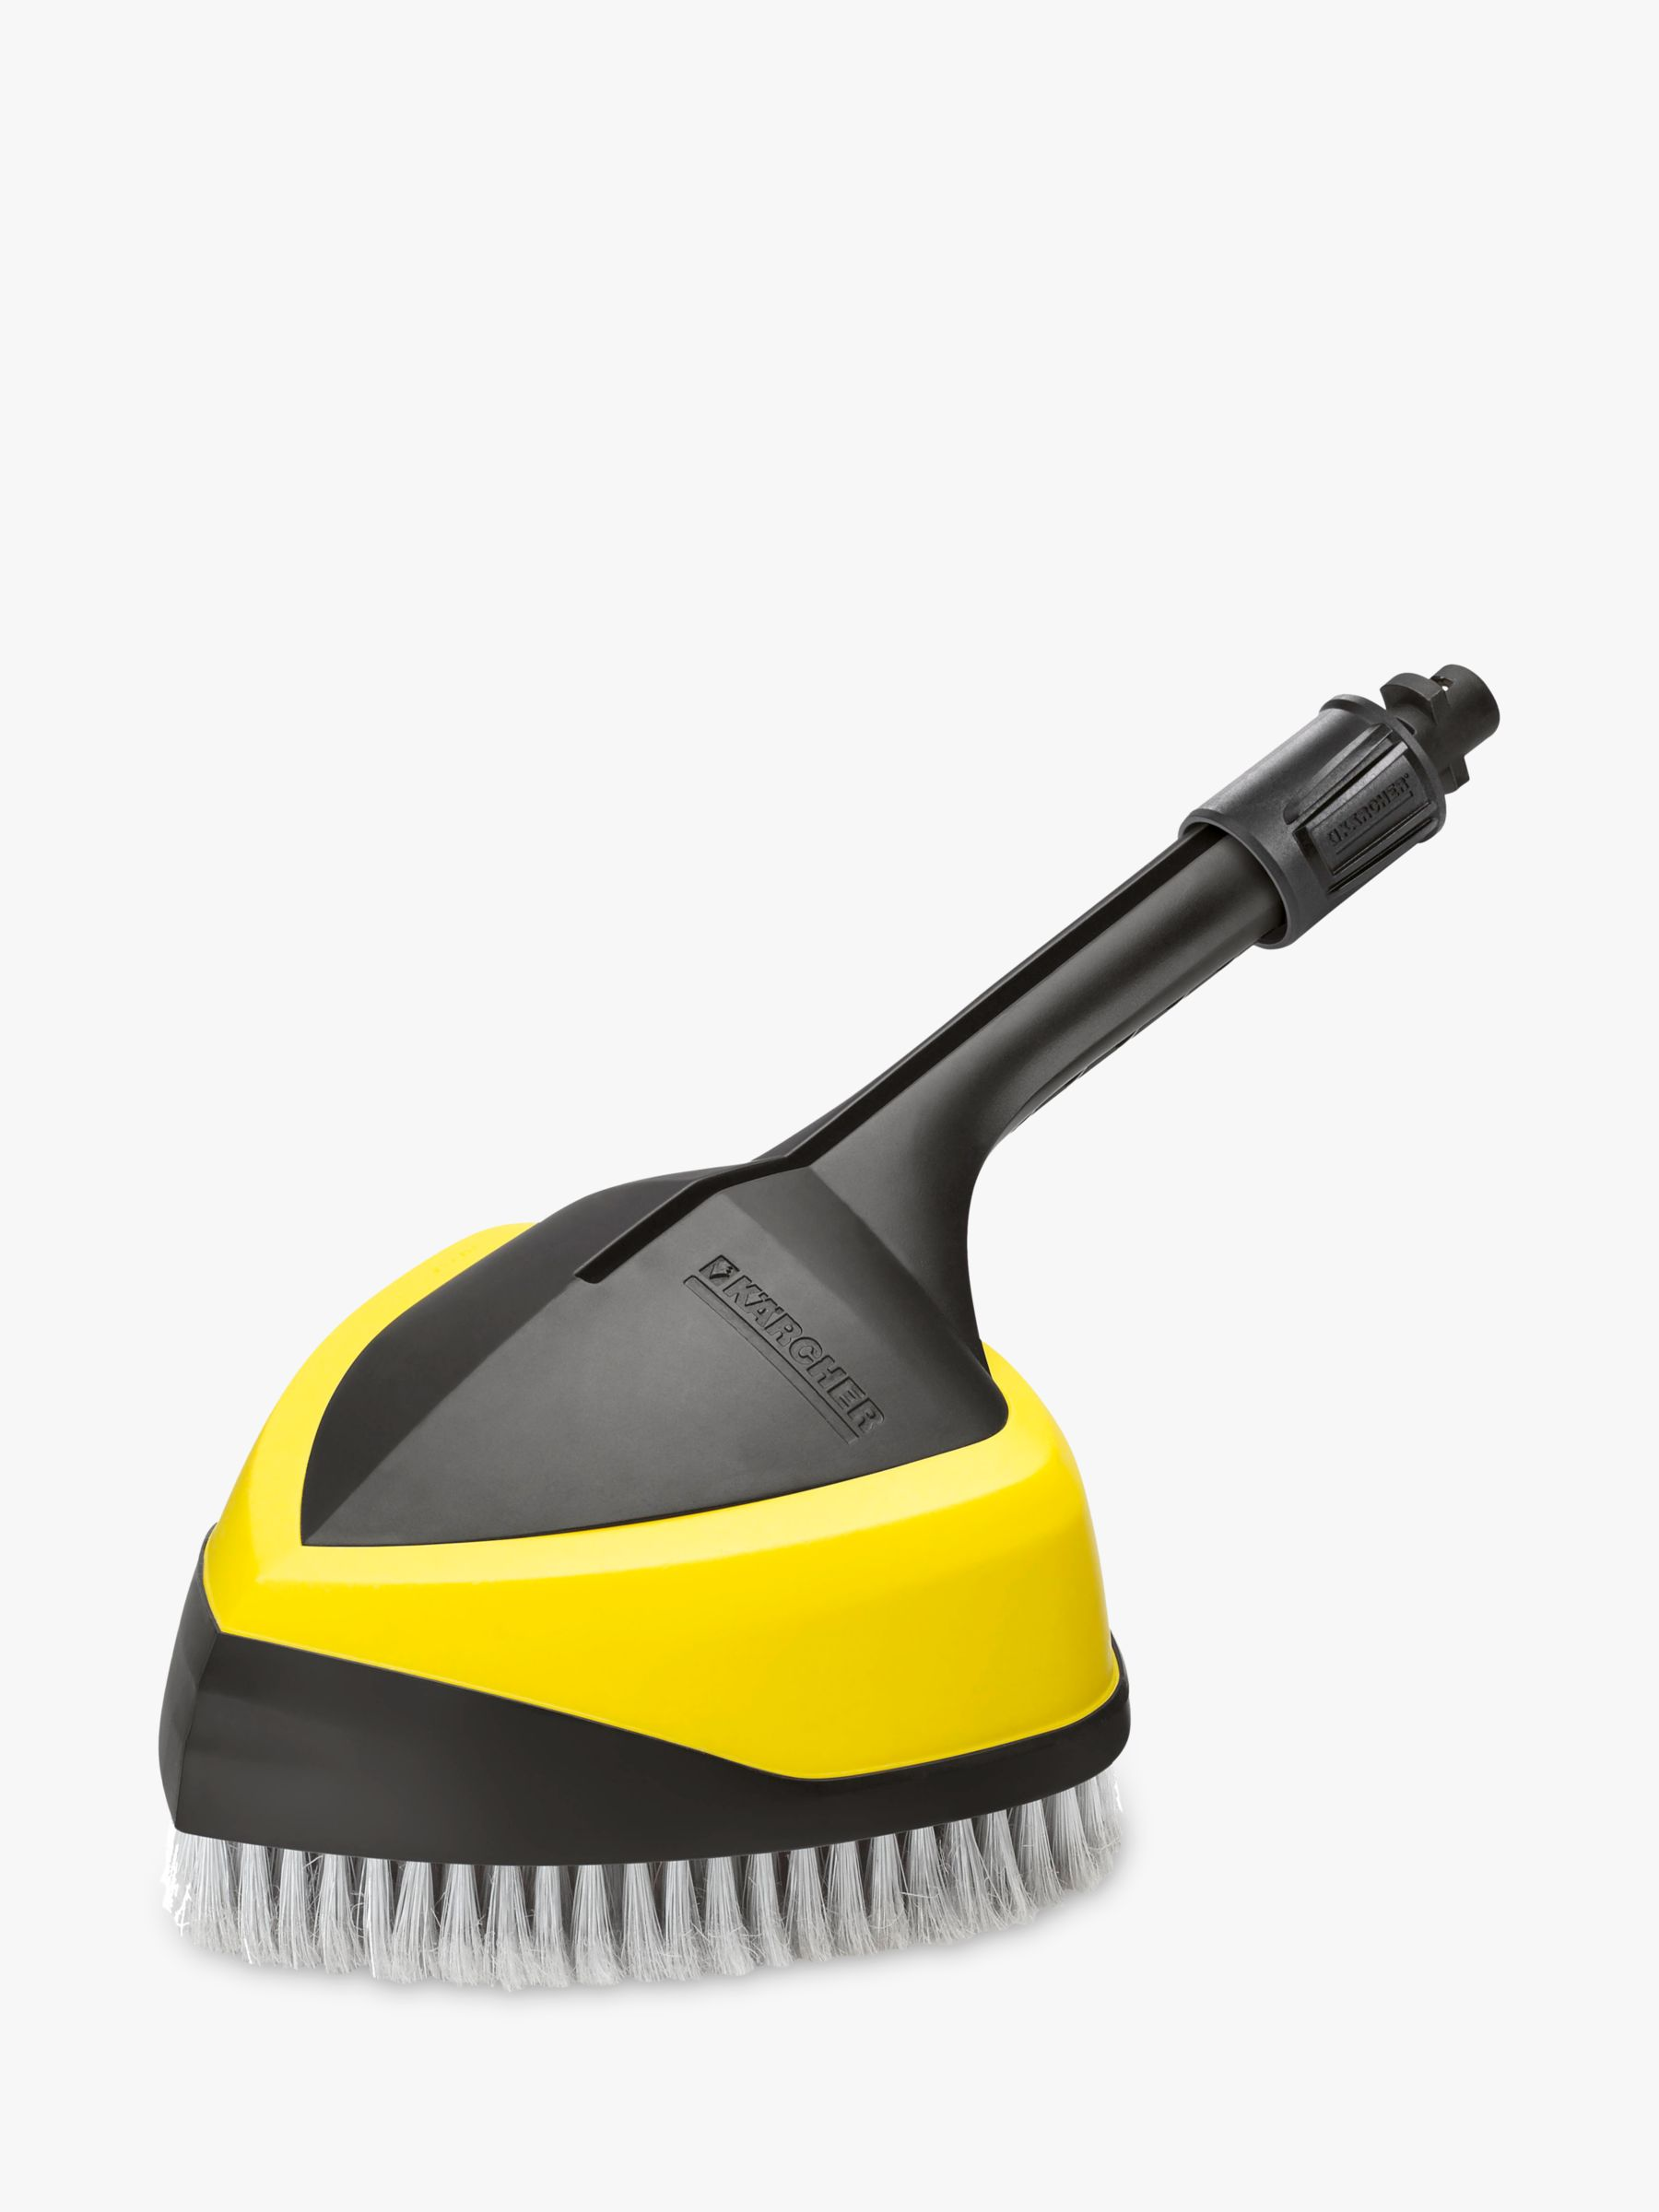 Karcher Kärcher WB 150 Power Brush